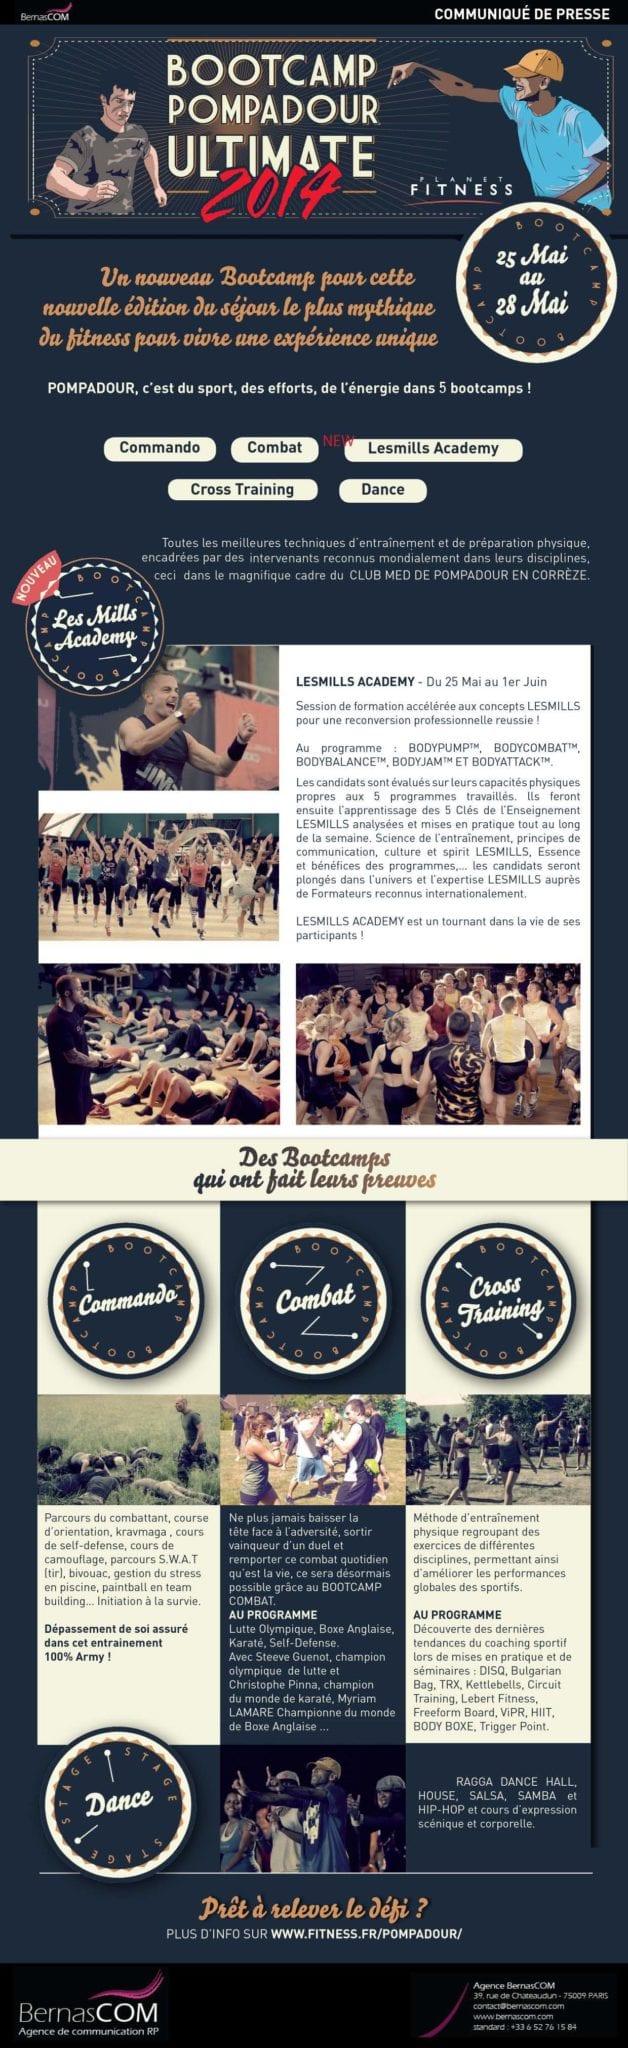 CP-Bootcamp Pompadour_2014